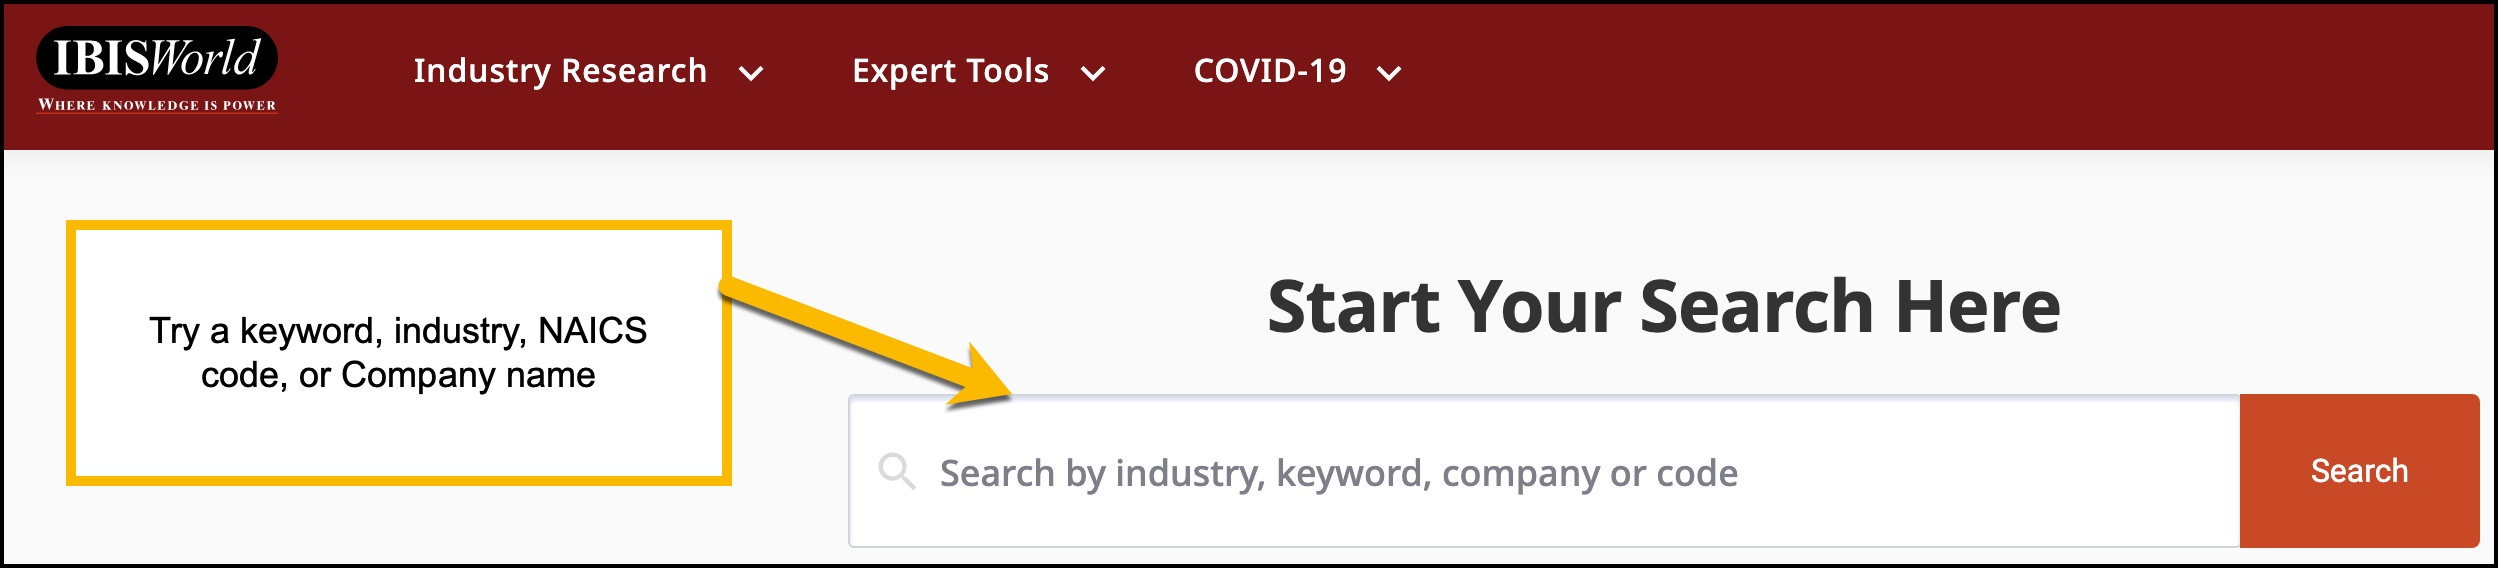 Screenshot of basec search bar for IBISWorld